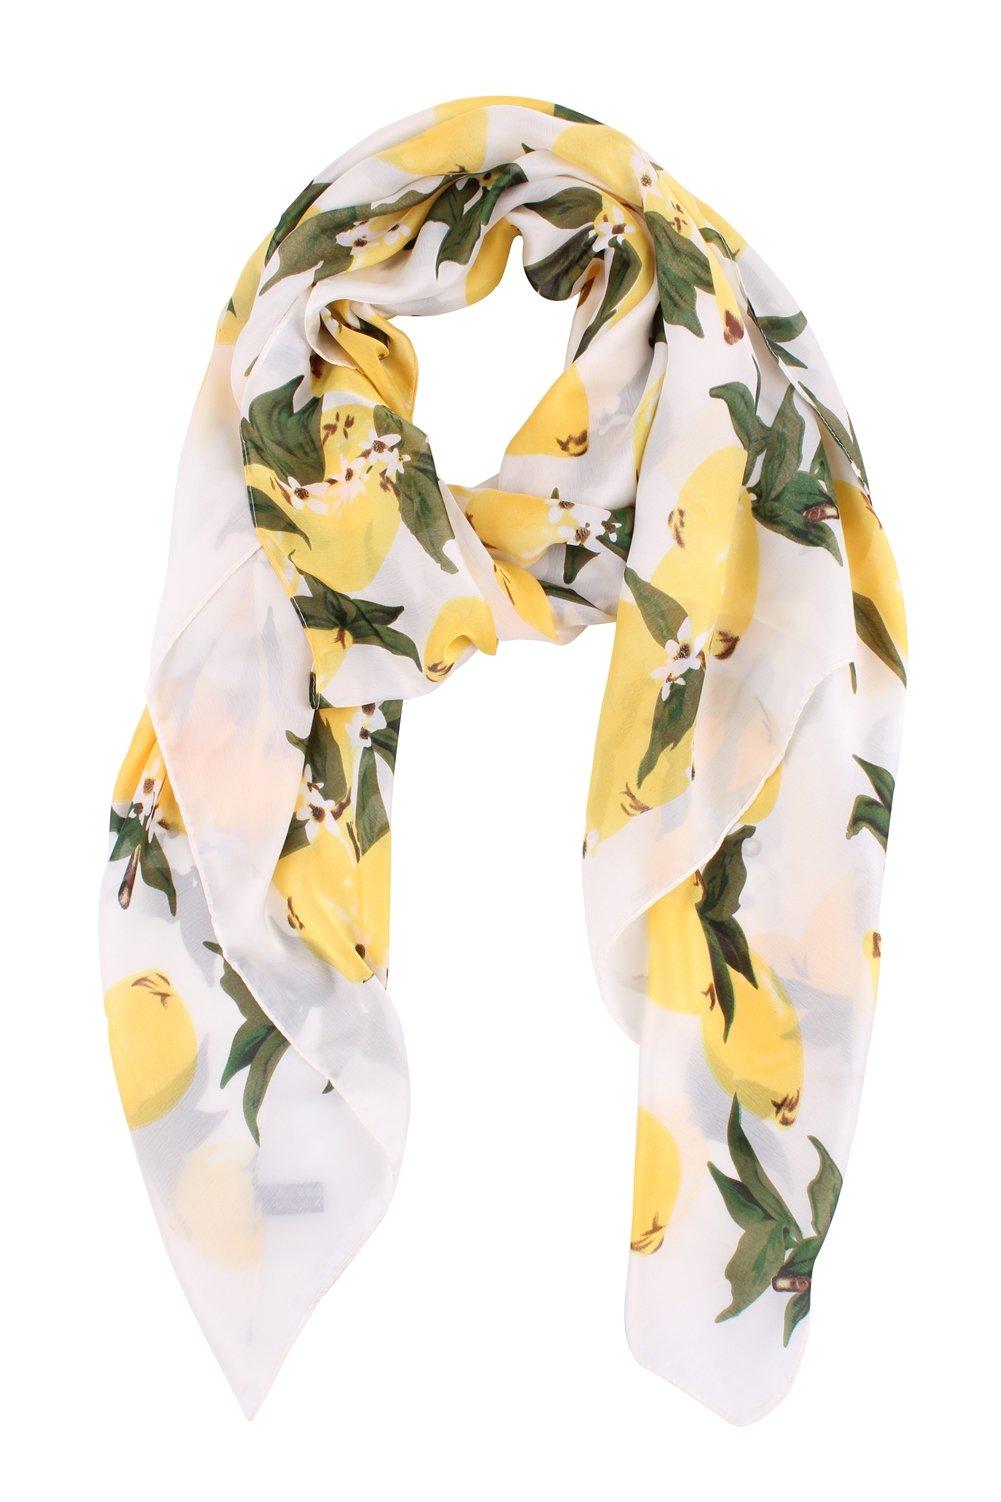 Jaweaver Lightweight Scarf Shawl Fruit Print Silk Like Long Beach Wrap For Women (Mango Yellow)